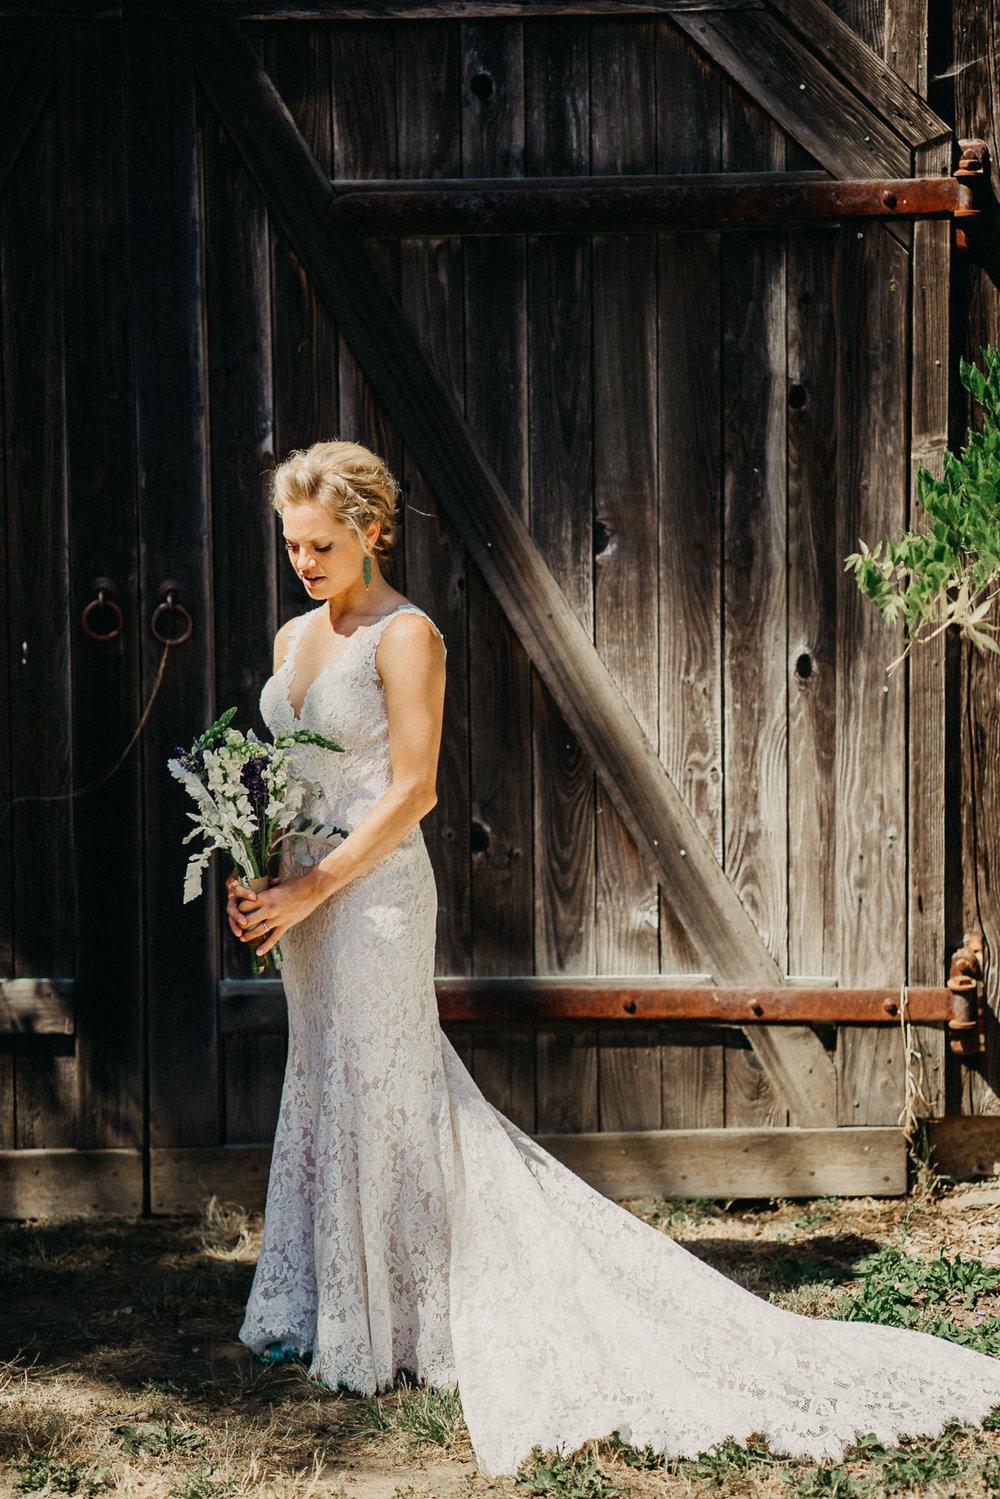 Summerhill-Farms-Portland-Wedding-Photographer-Backyard-Vineyard-15.jpg